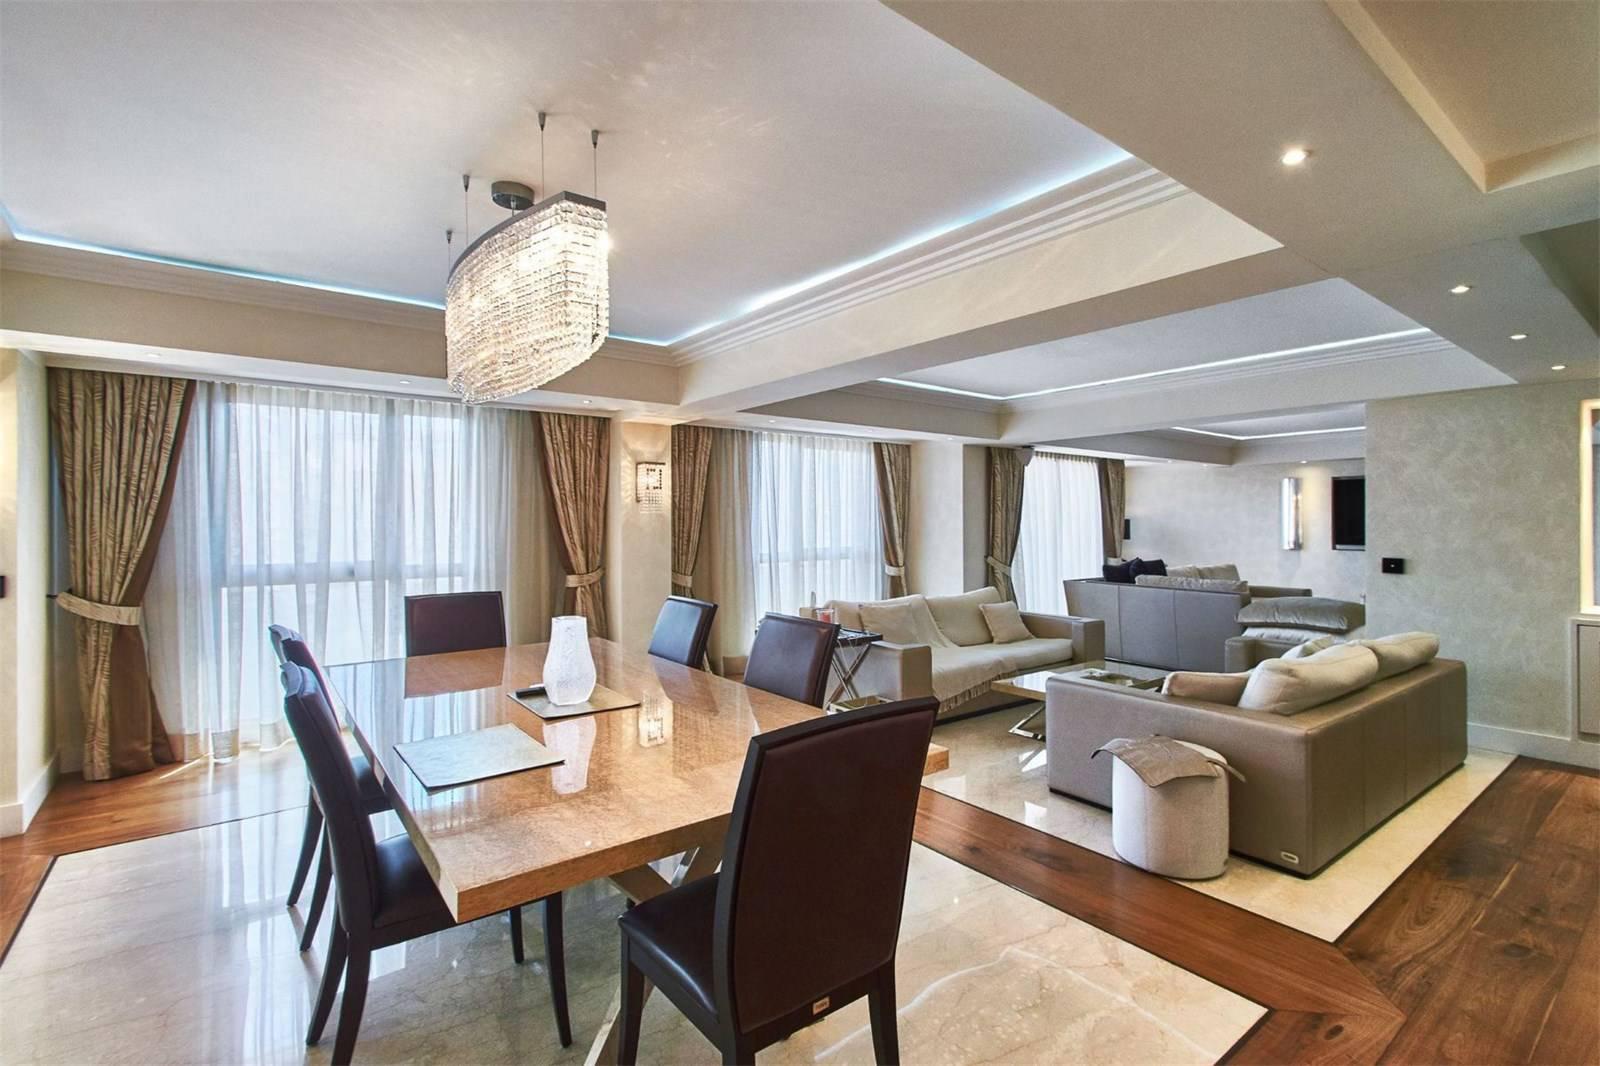 A luxury penthouse for sale near La Croisette in Cannes